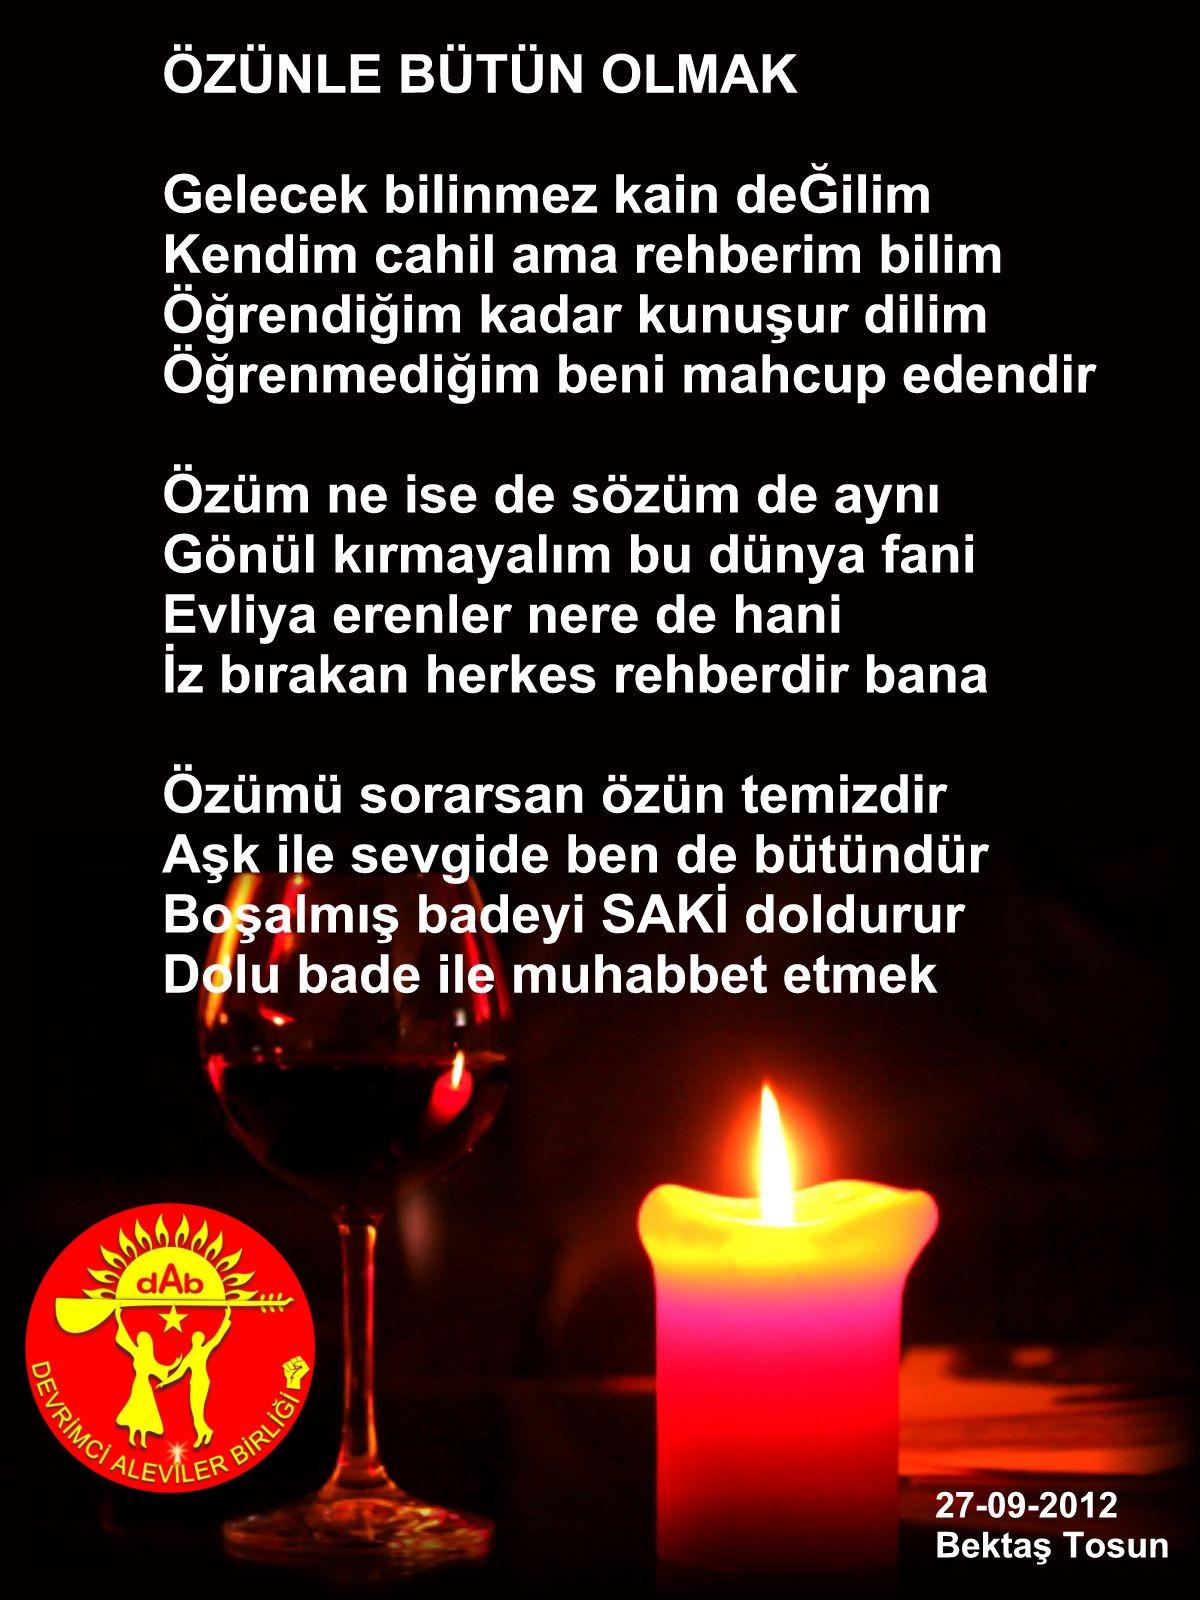 Alevi Bektaşi Kızılbaş Pir Sultan Devrimci Aleviler Birliği DAB sarap bektas tosun